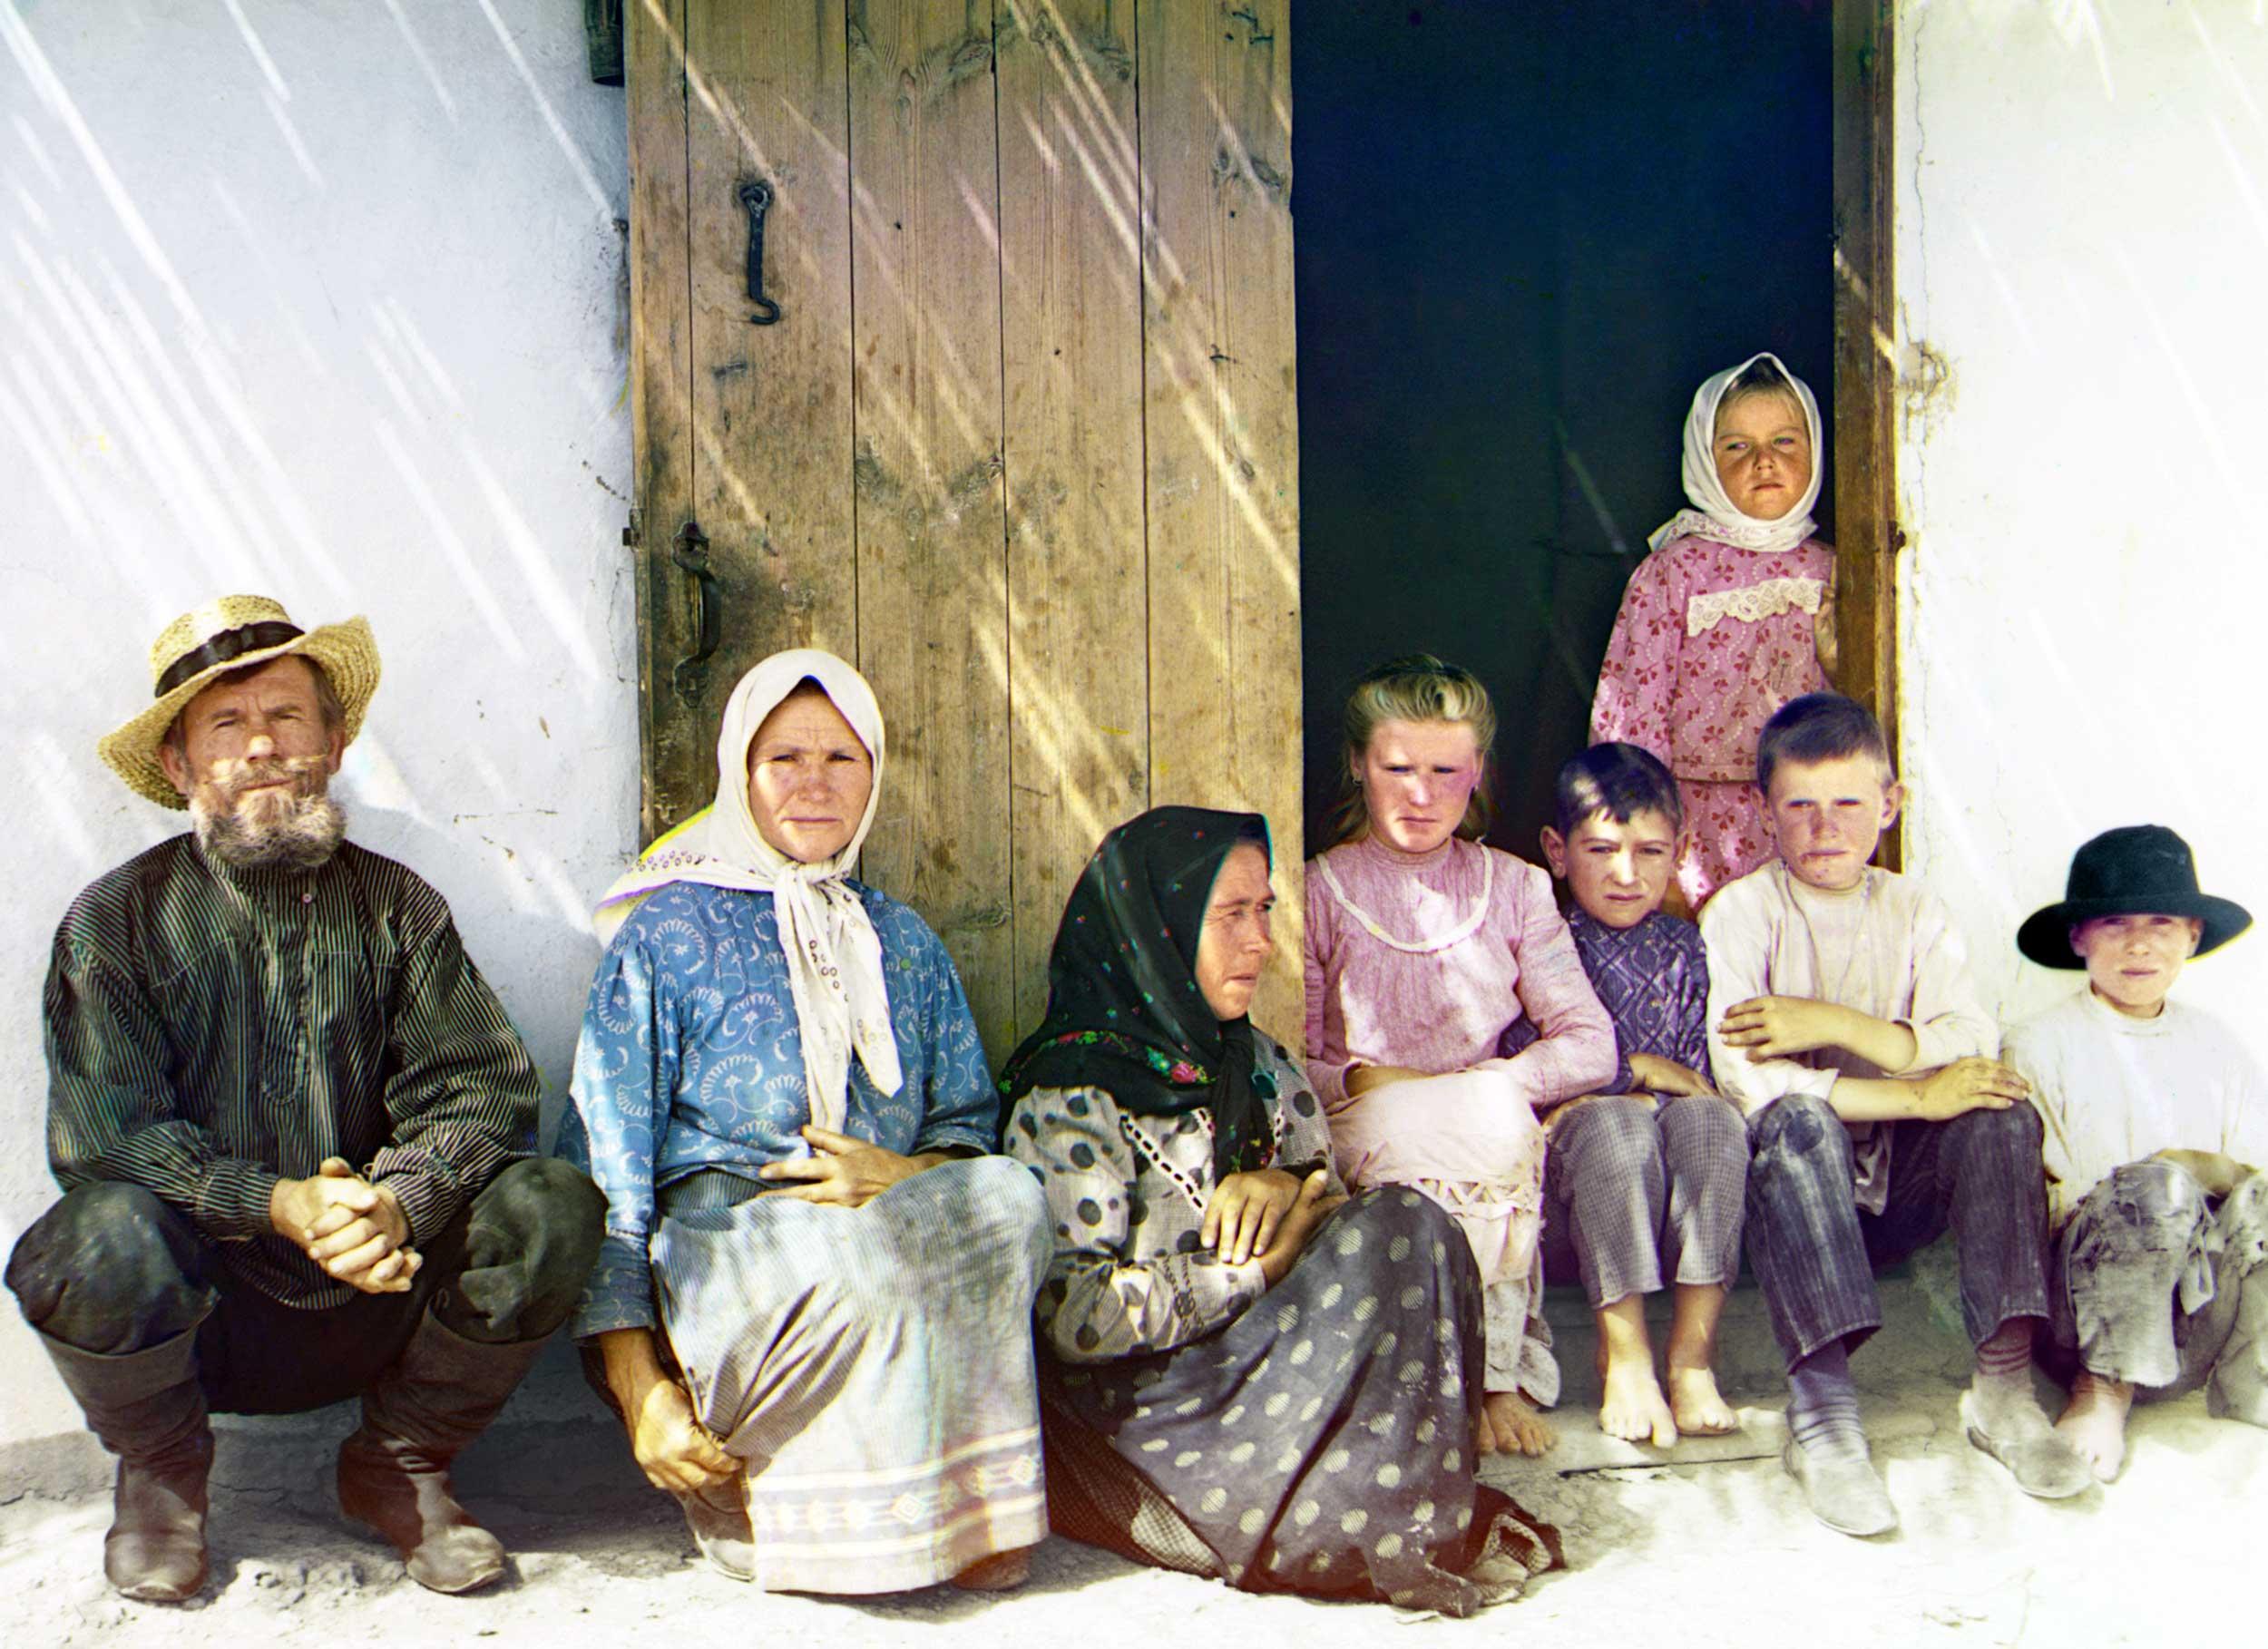 Ethnic Russian settlers